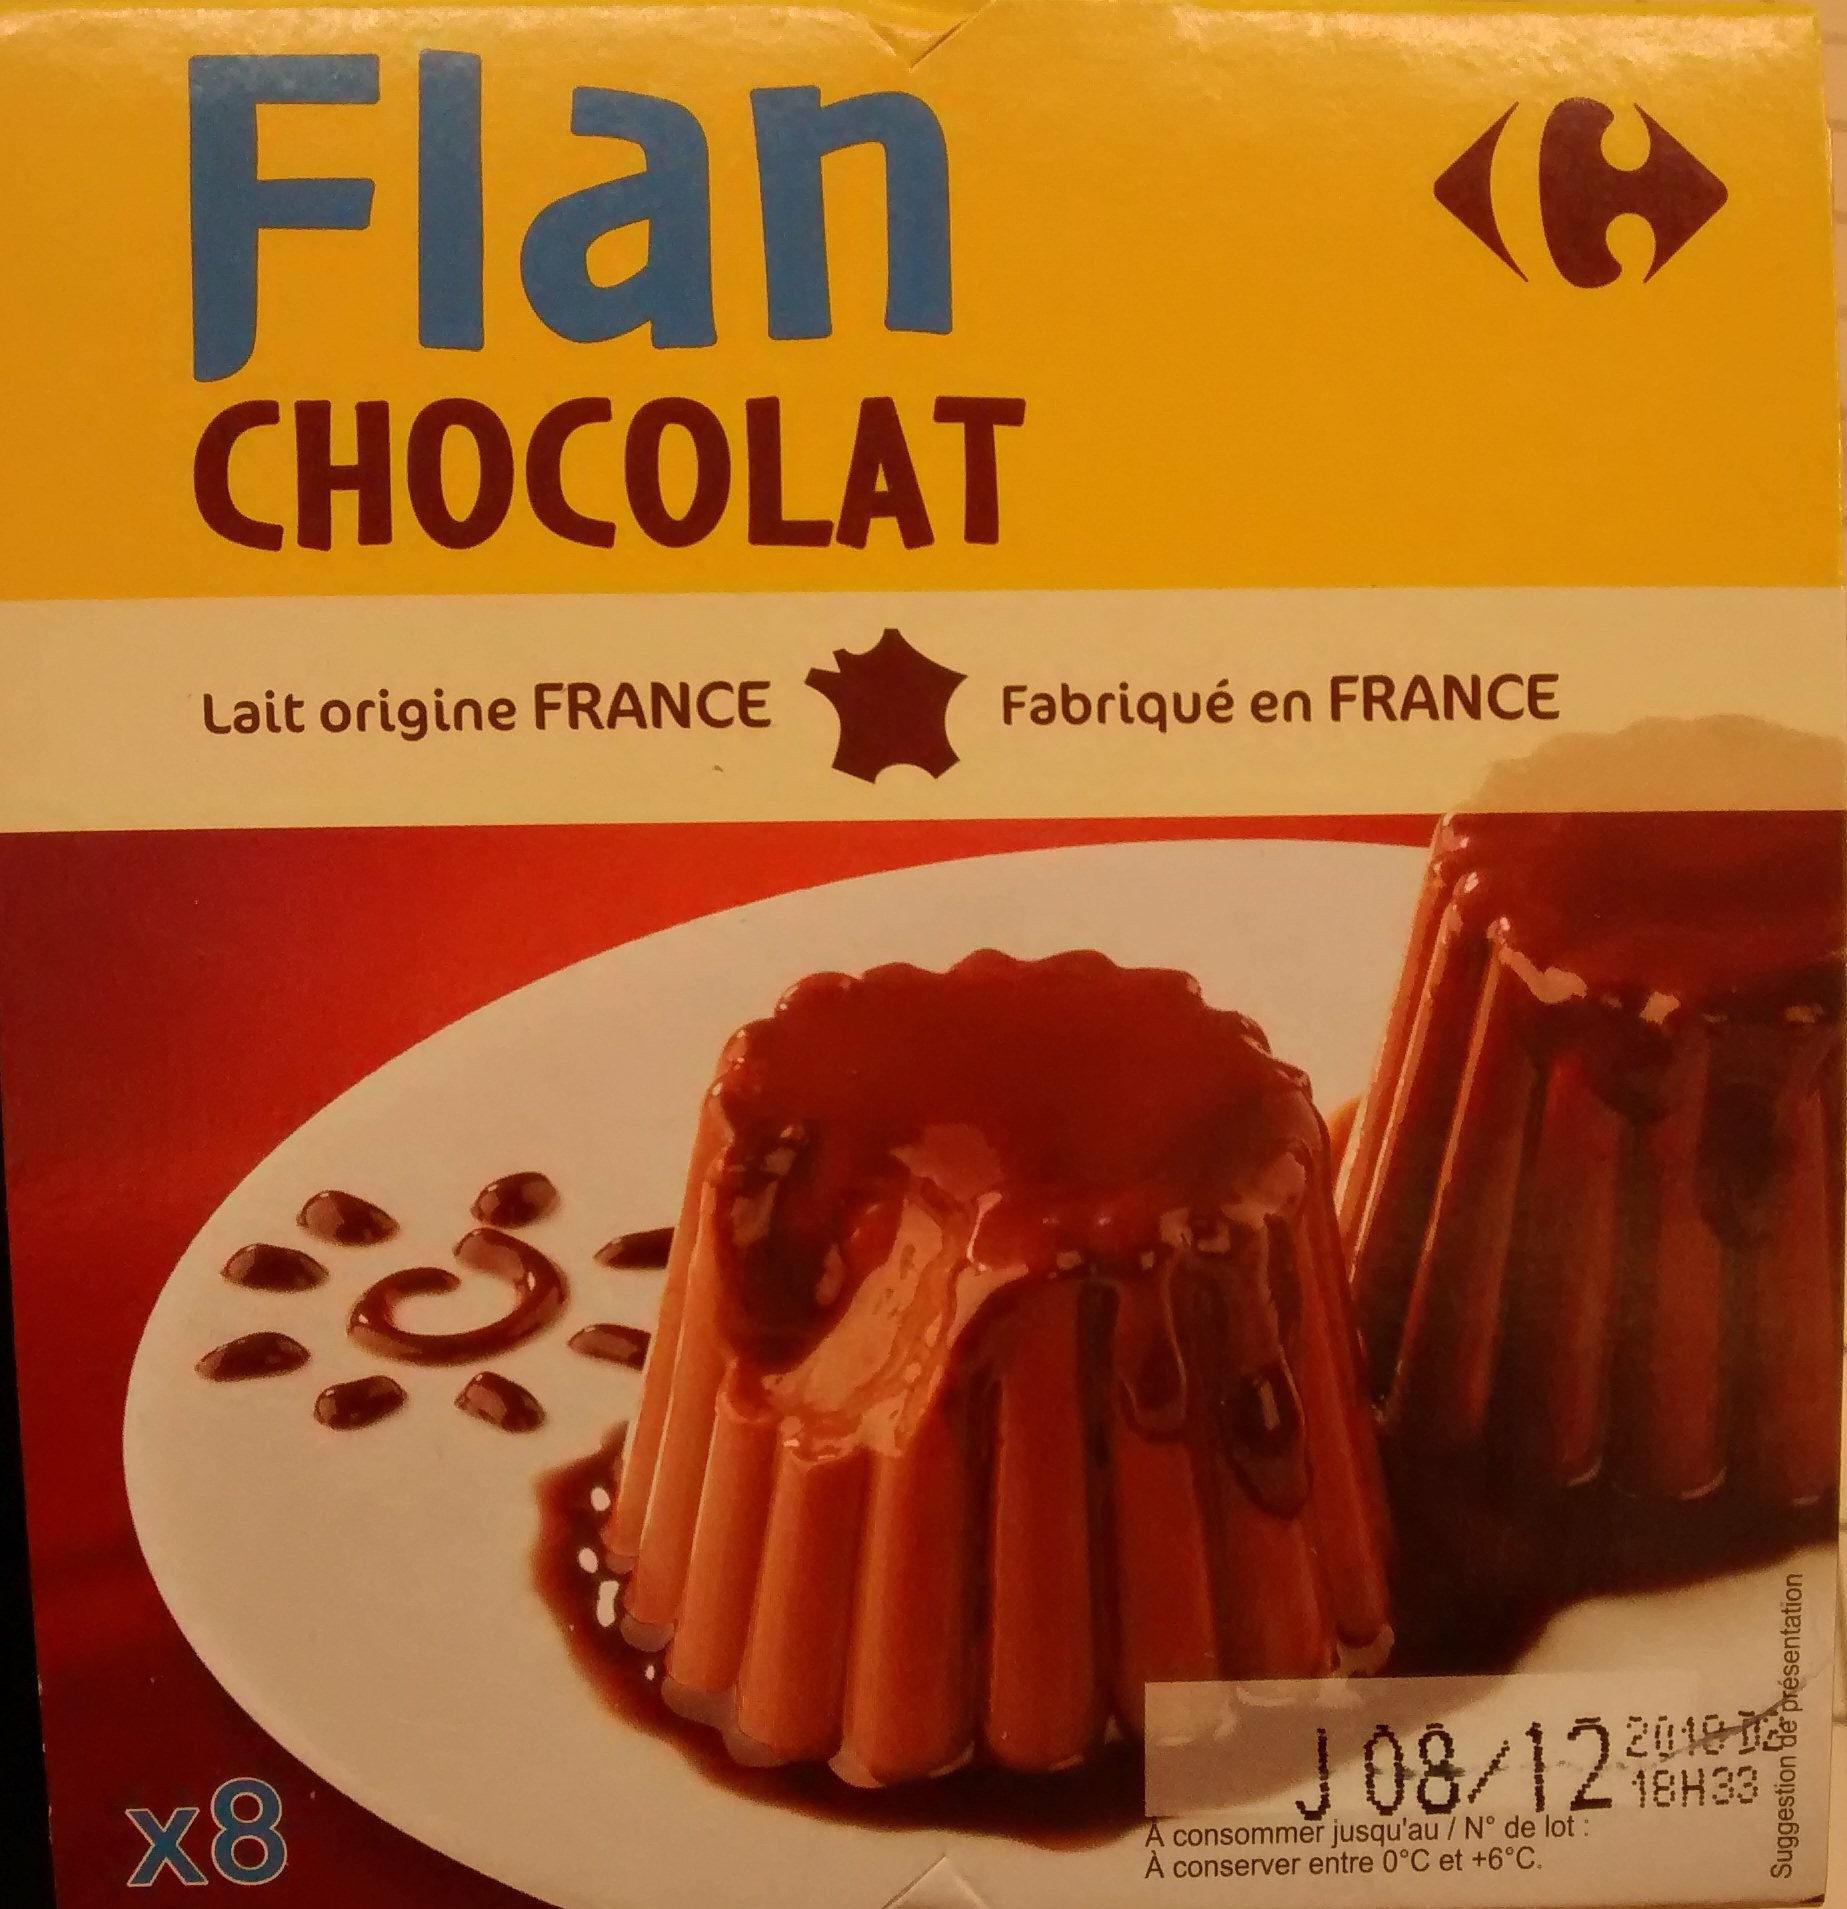 Flan Chocolat Carrefour Kids 800g 8 X 100g